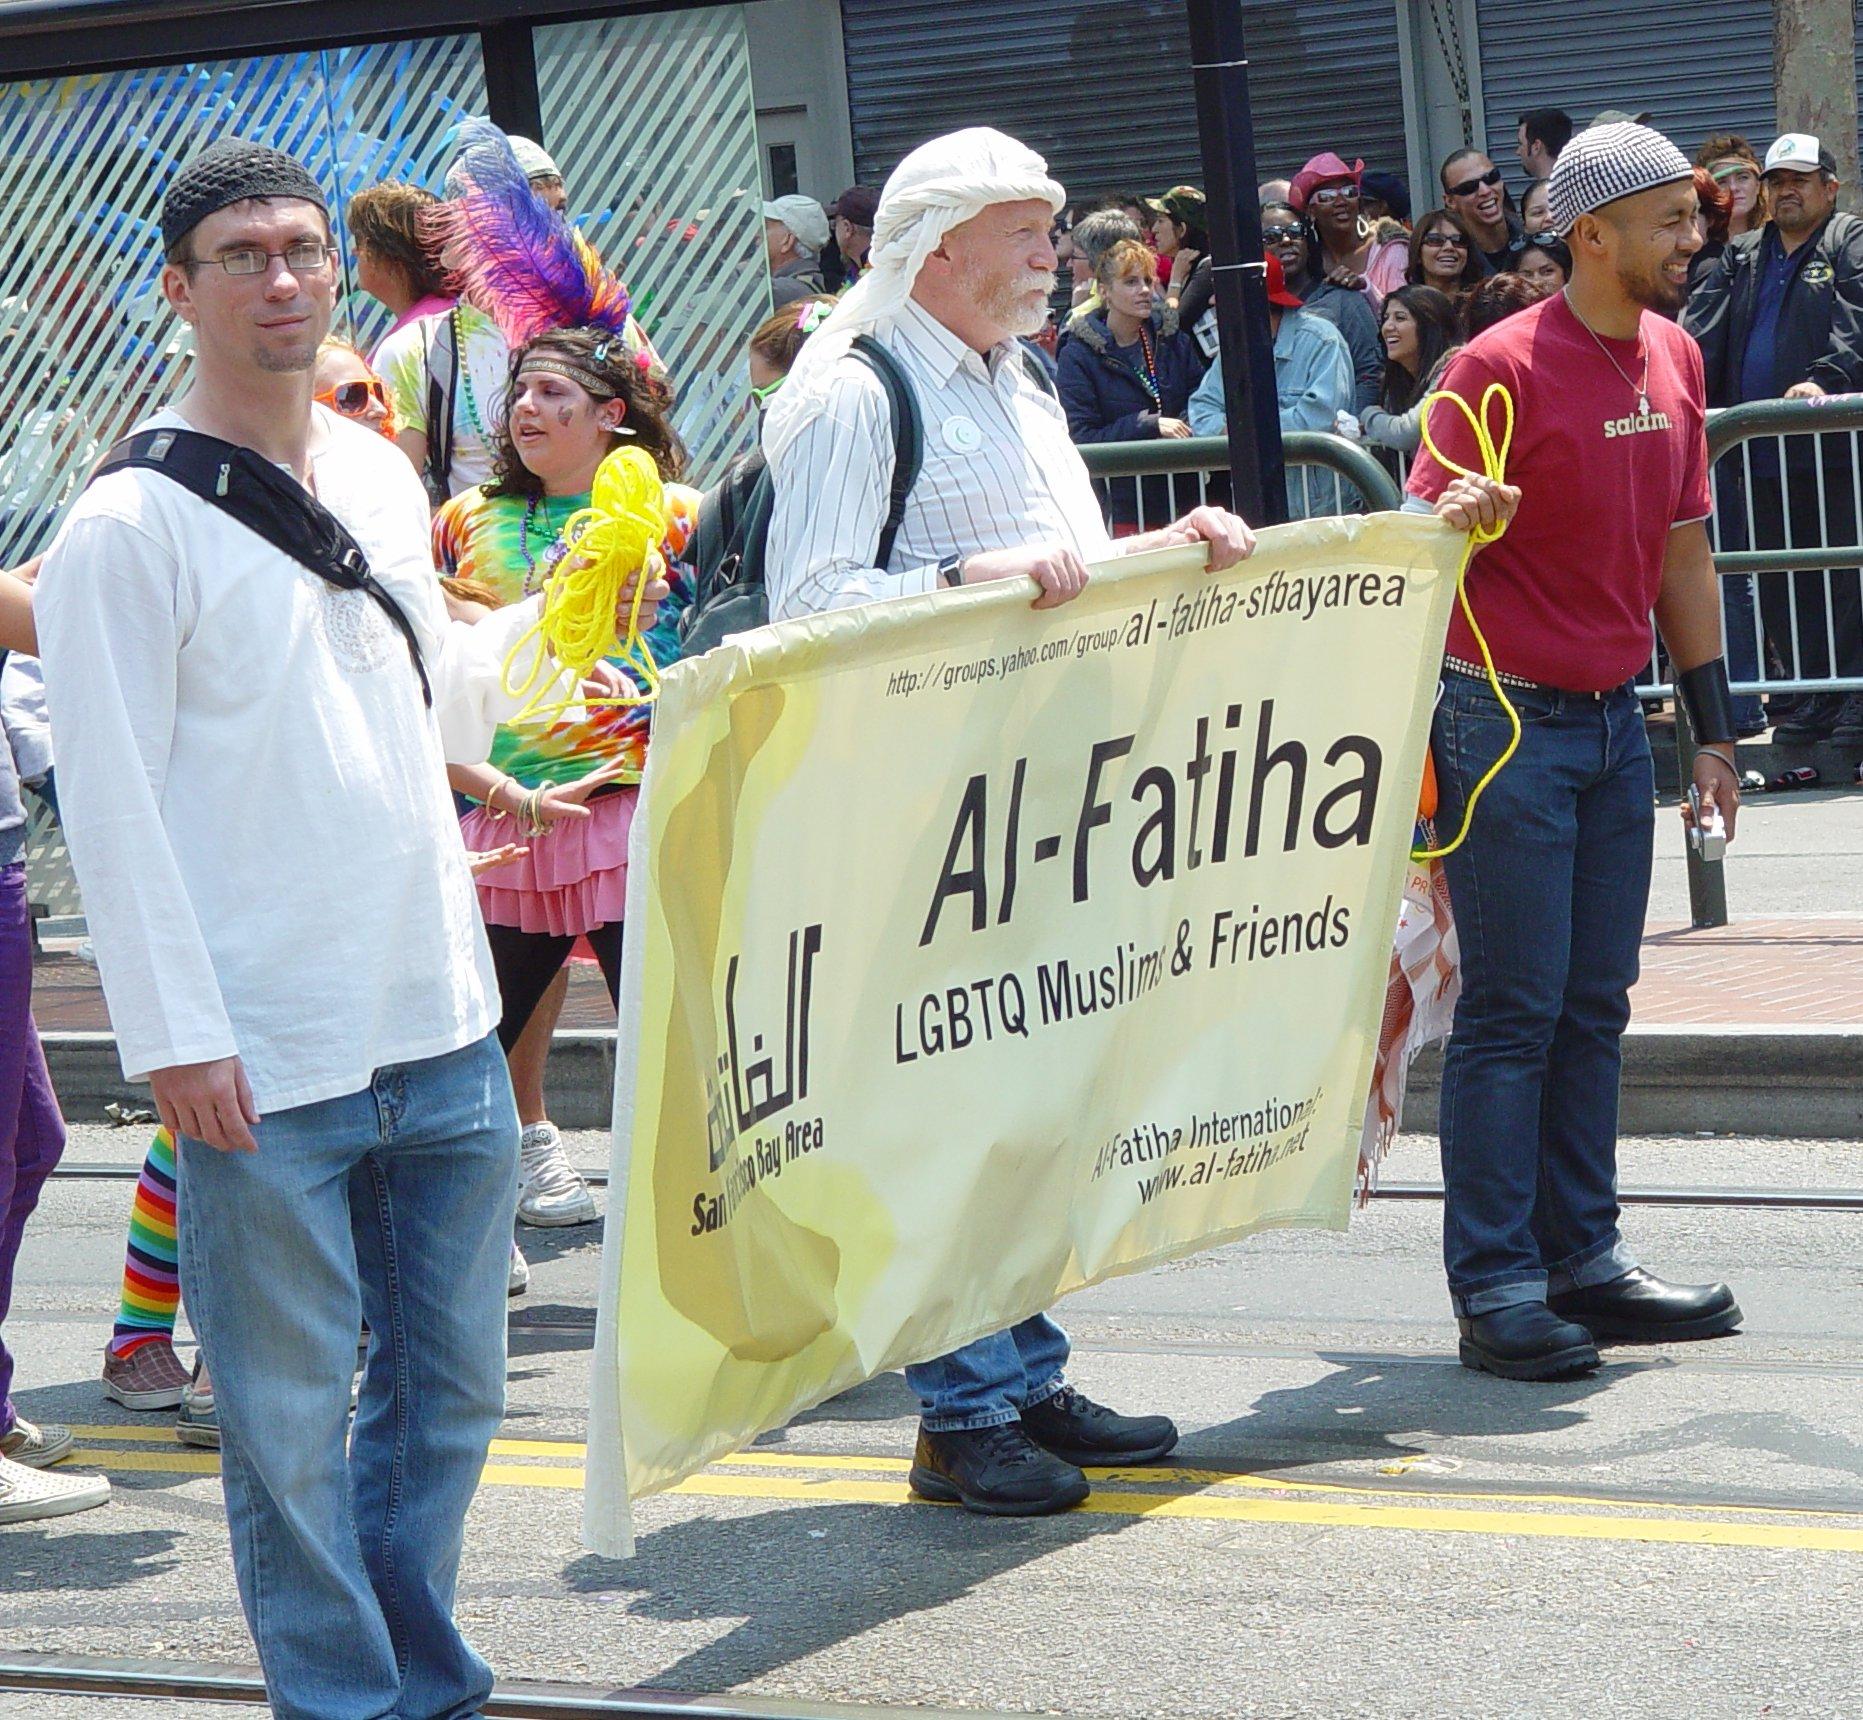 File:Al-Fatiha Muslim Gays - Gay Parade 2008 in San Francisco (2626954534